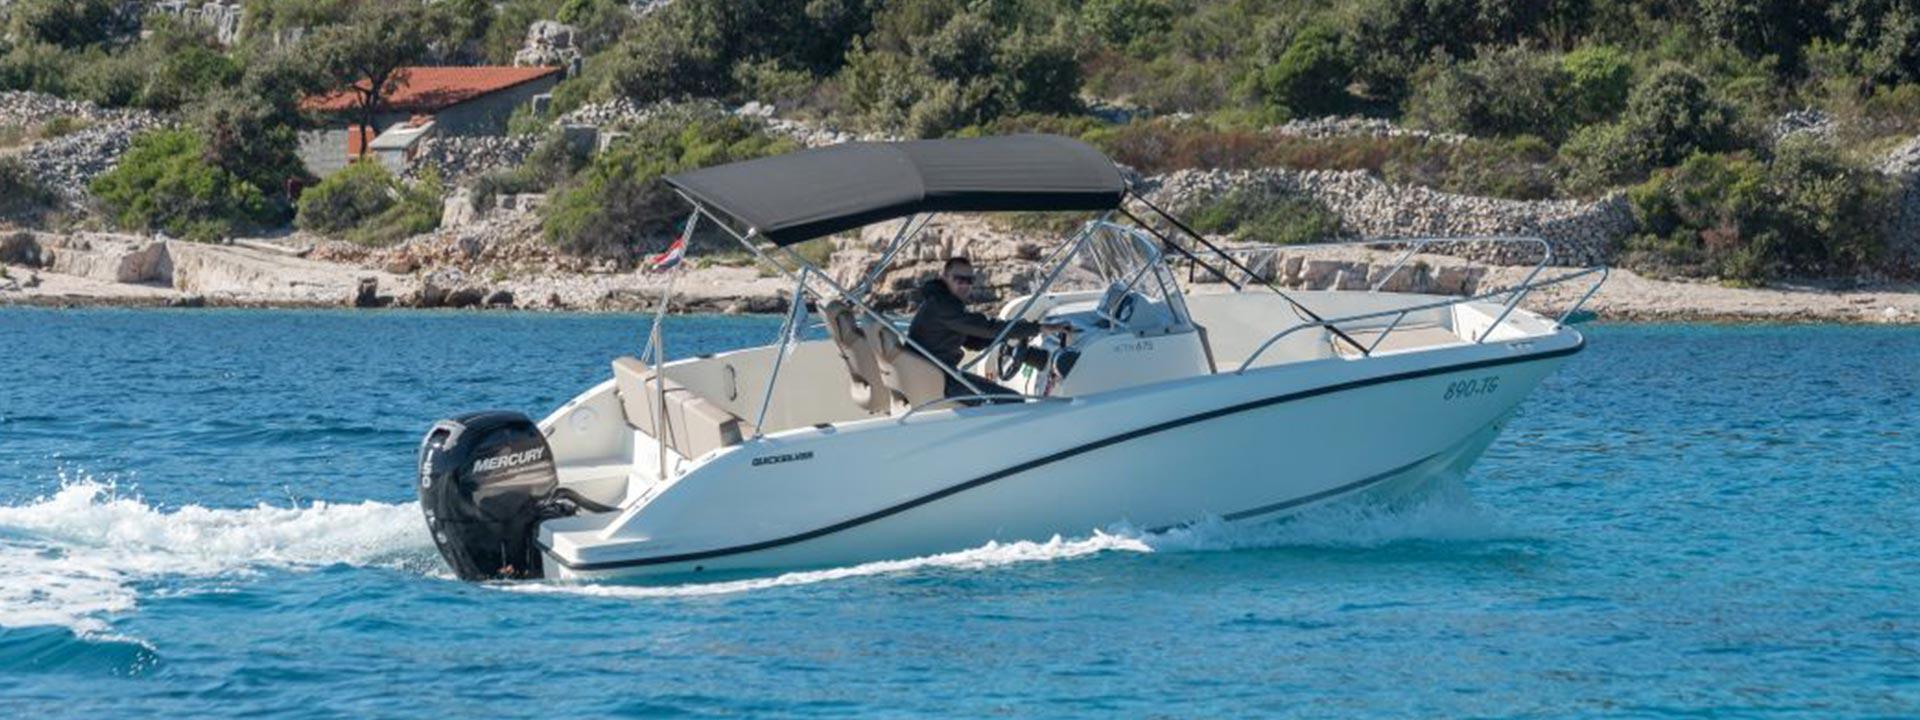 mayer-charter-boat-header-quicksilver-activ-675-open-01